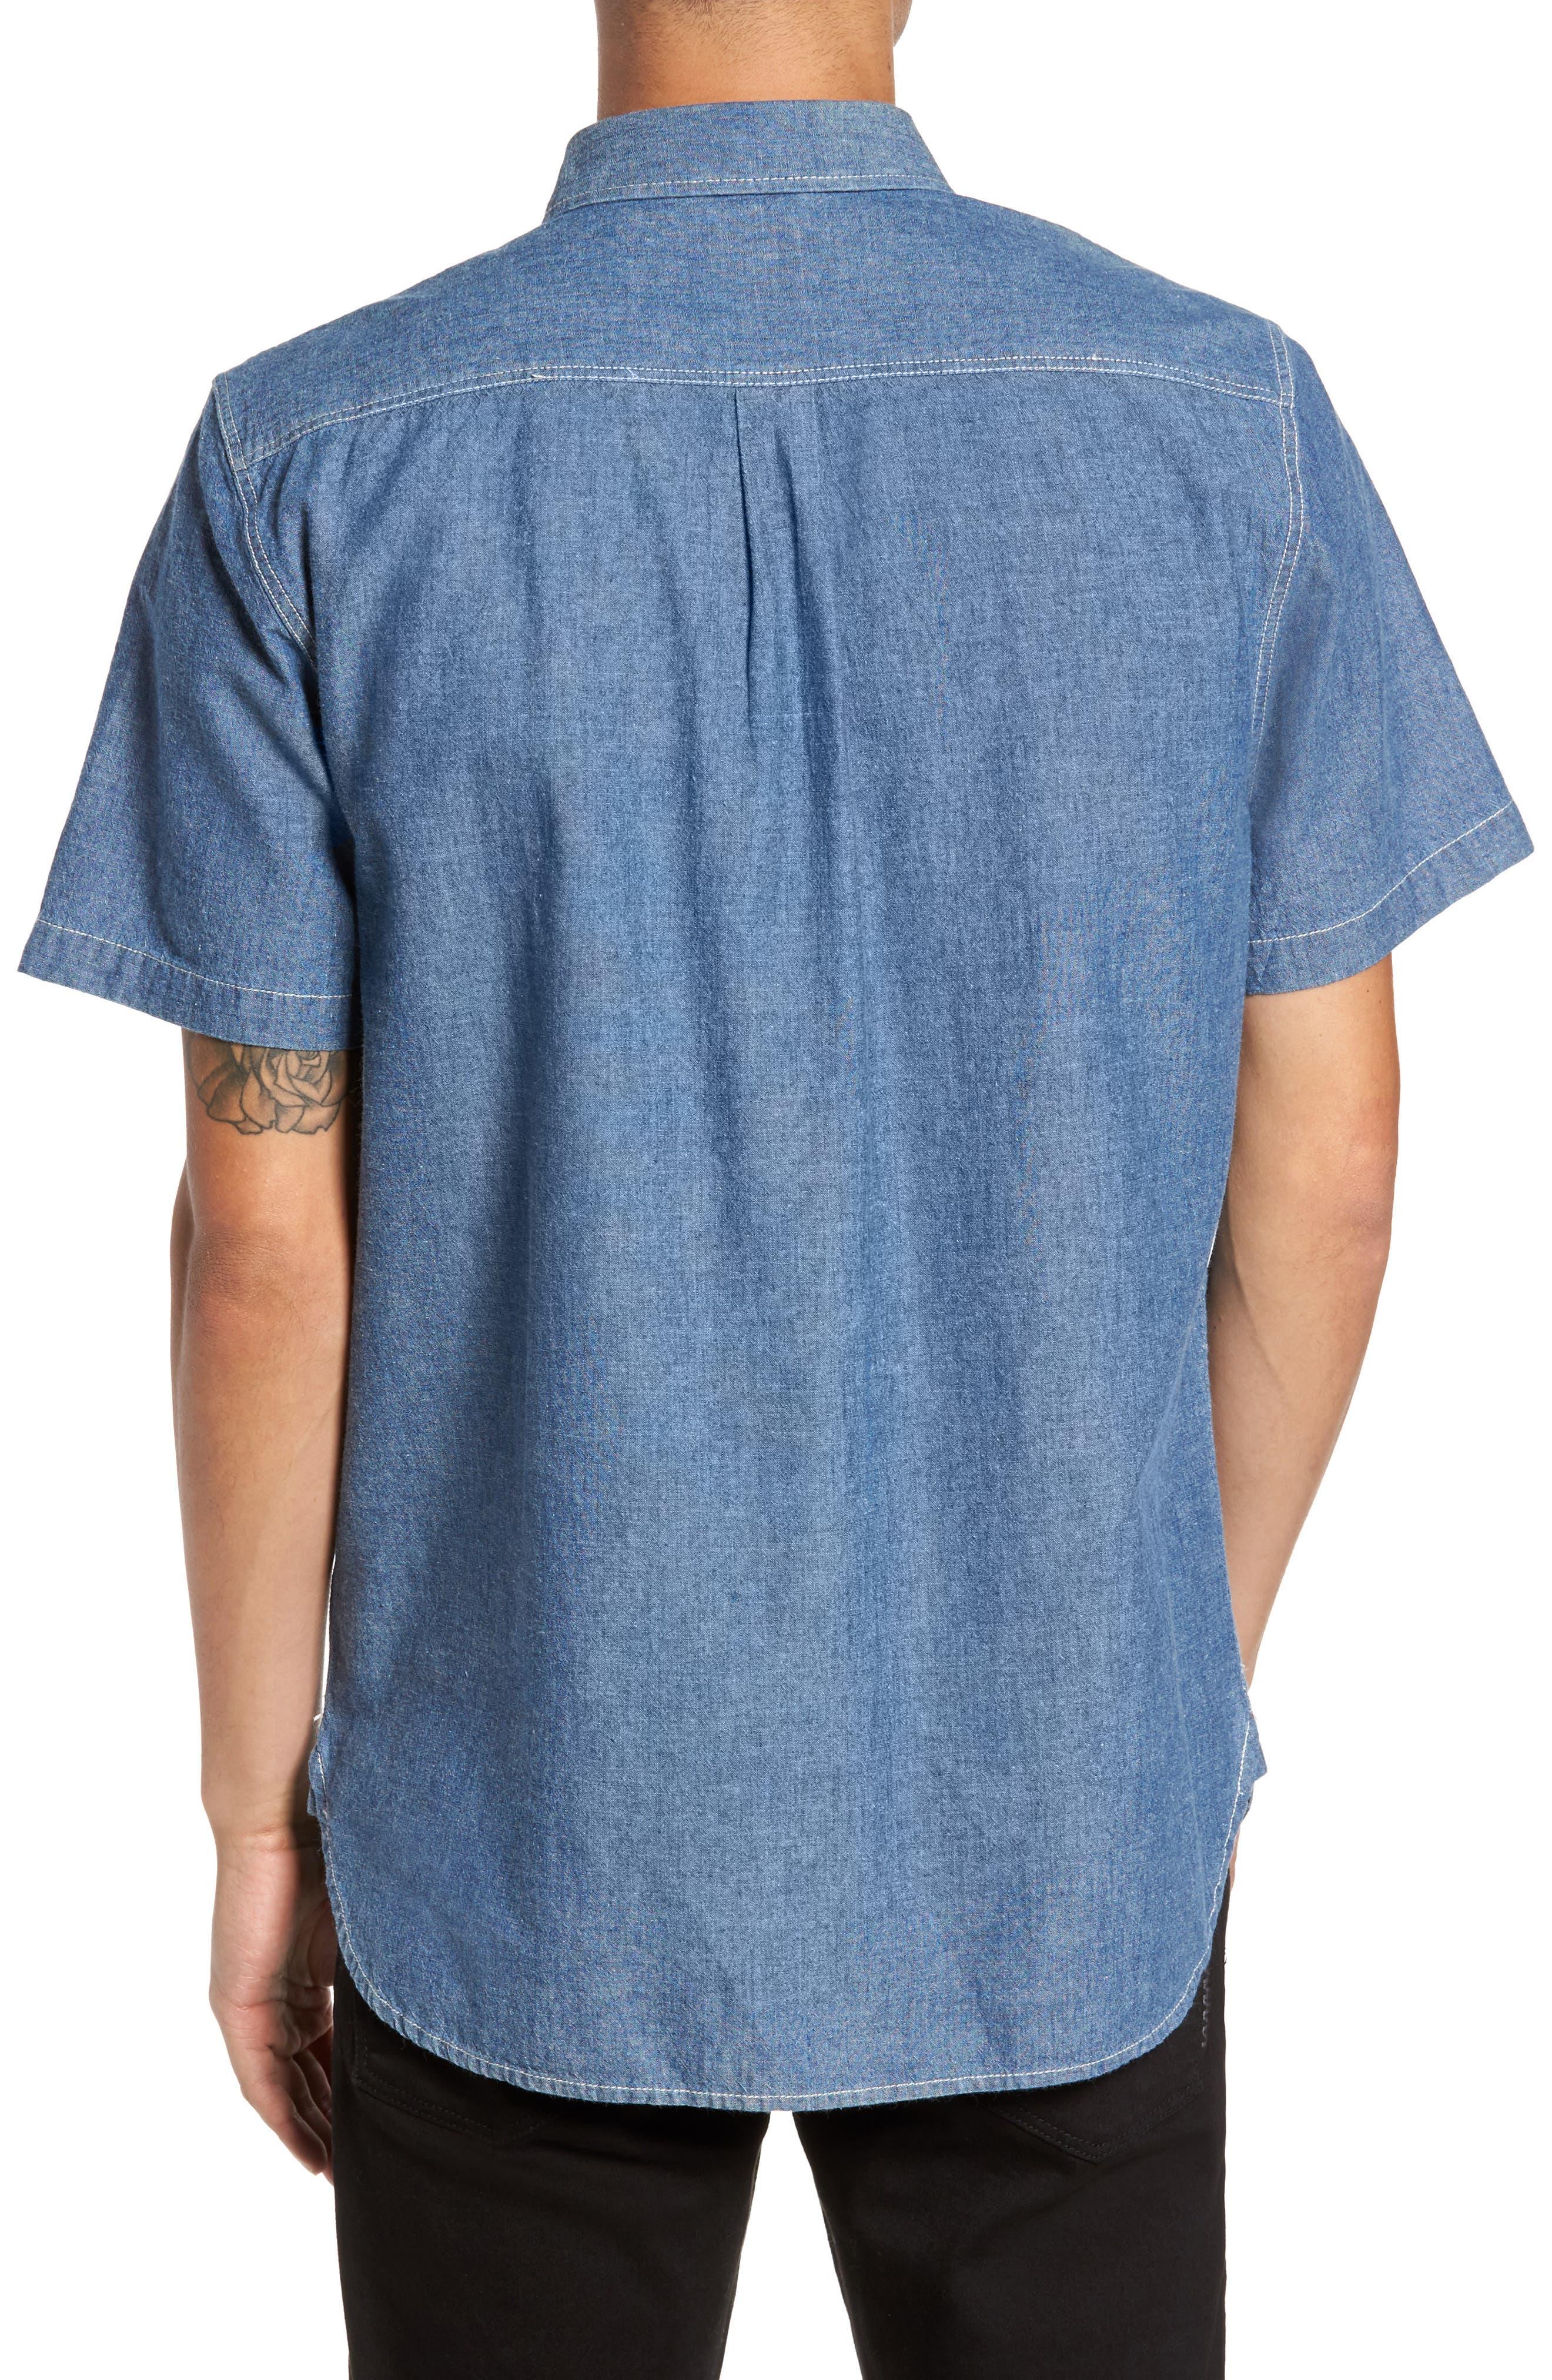 Alternate Image 2  - Vans Carlow Chambray Woven Shirt